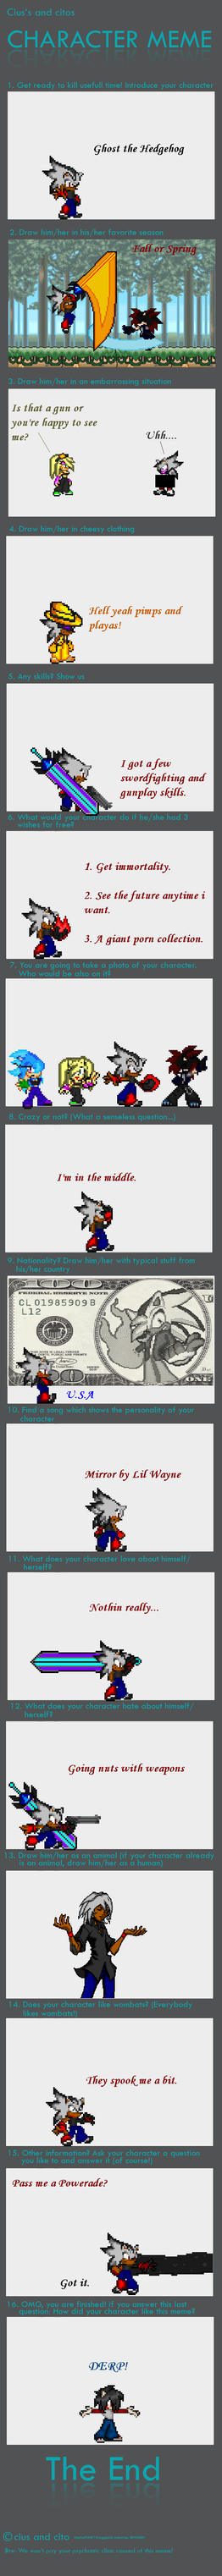 Chara Meme by GhosttheHedgehog12